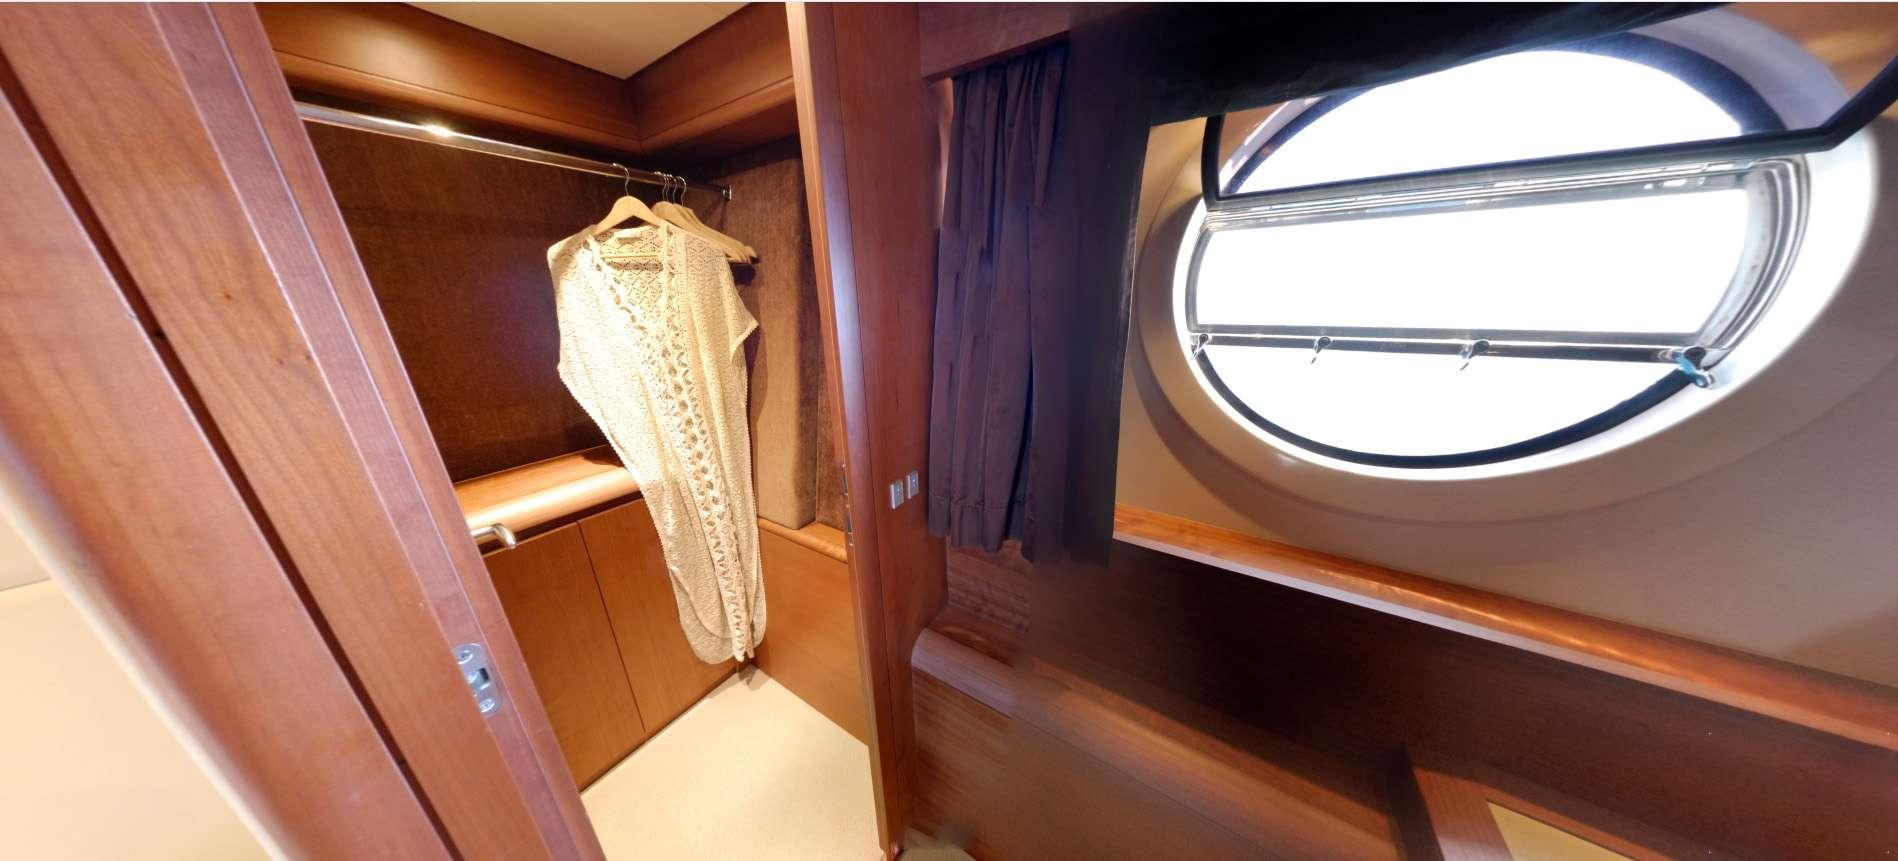 Master cabin has 2 large circular windows